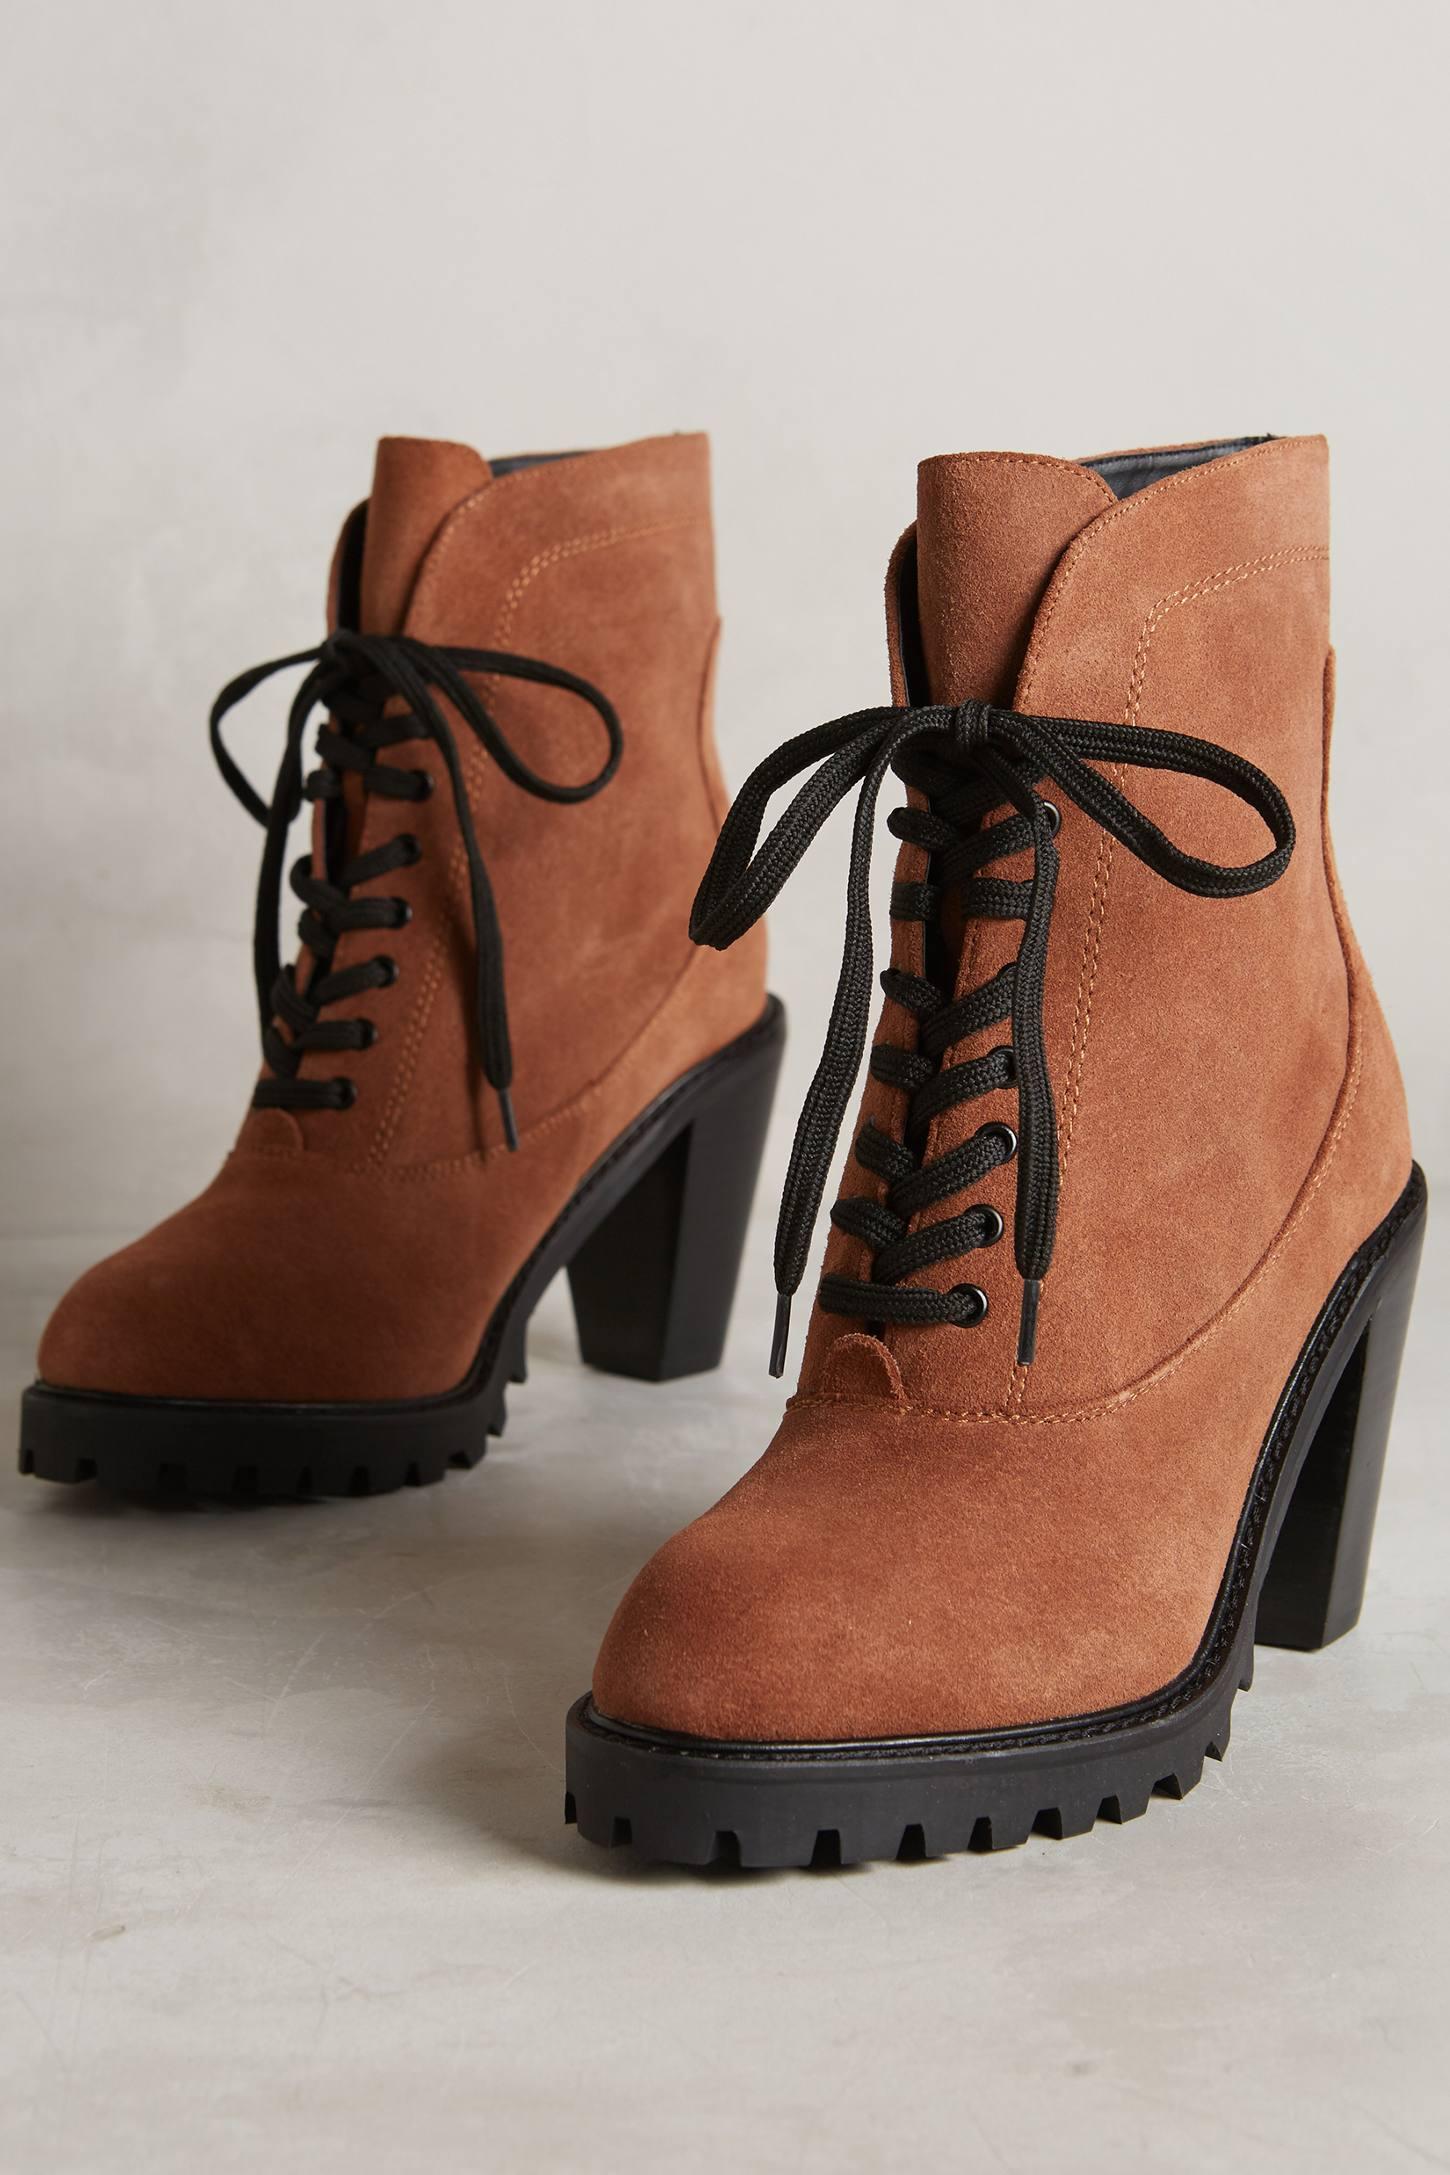 Kelsi Dagger Berlin Boots